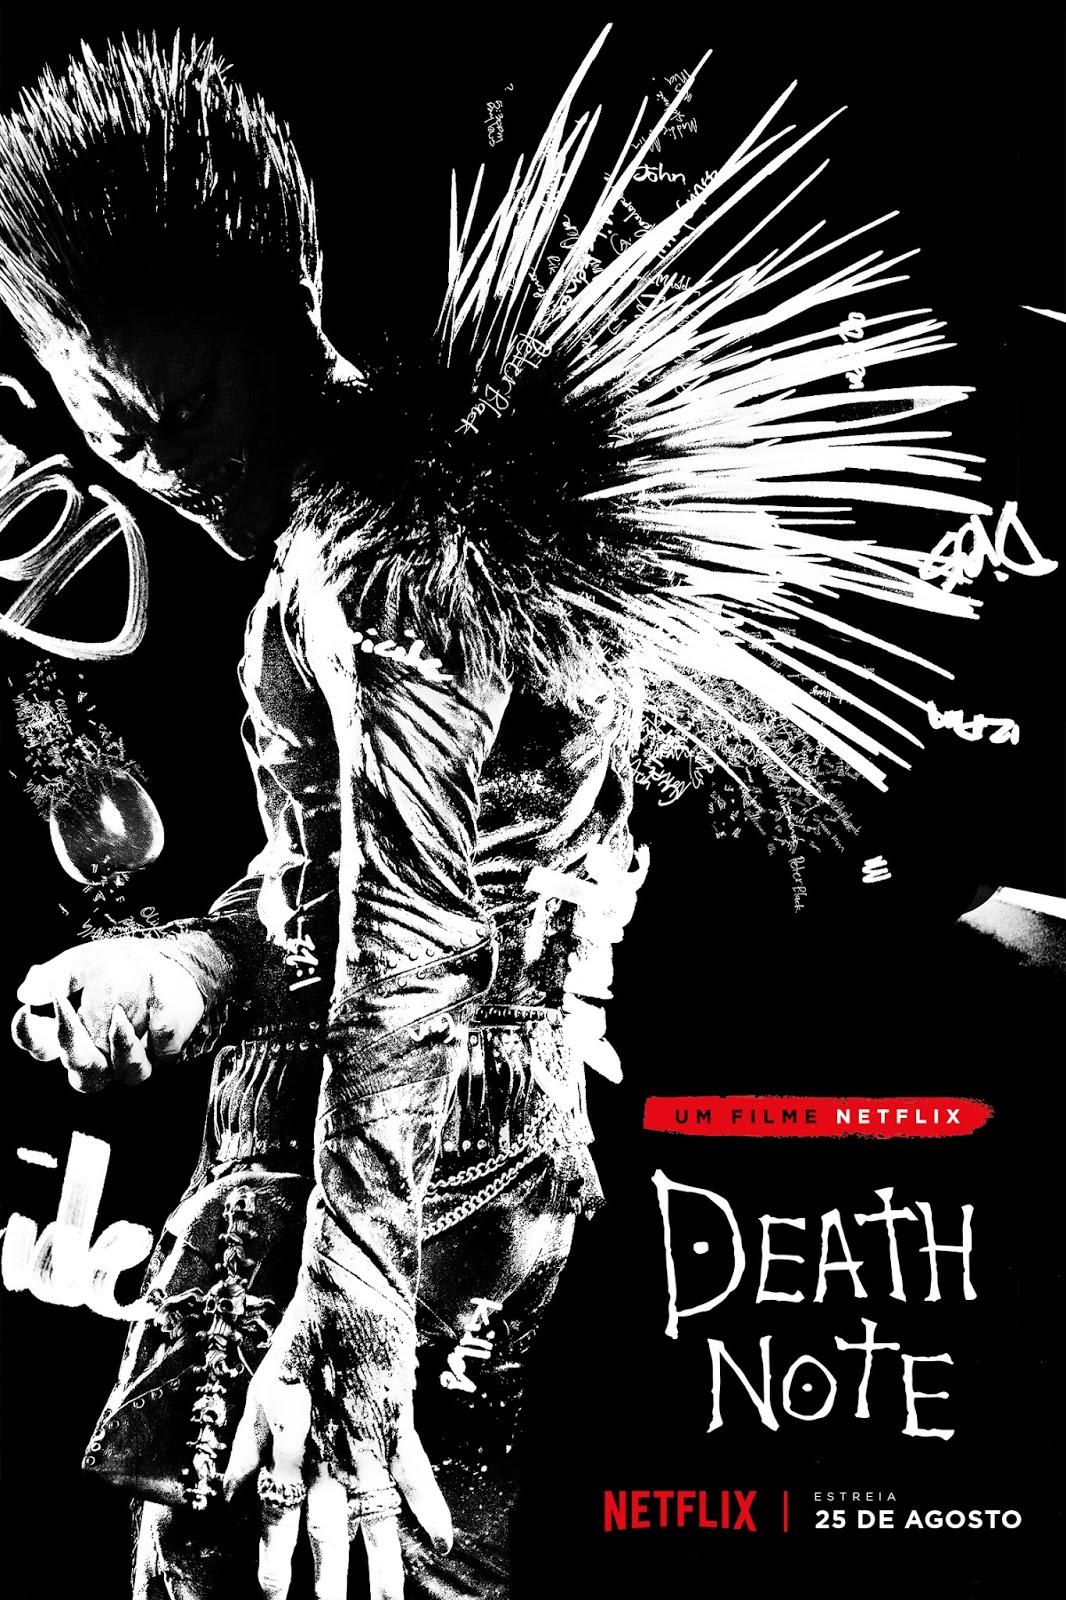 Death Note poster oficial da Netflix